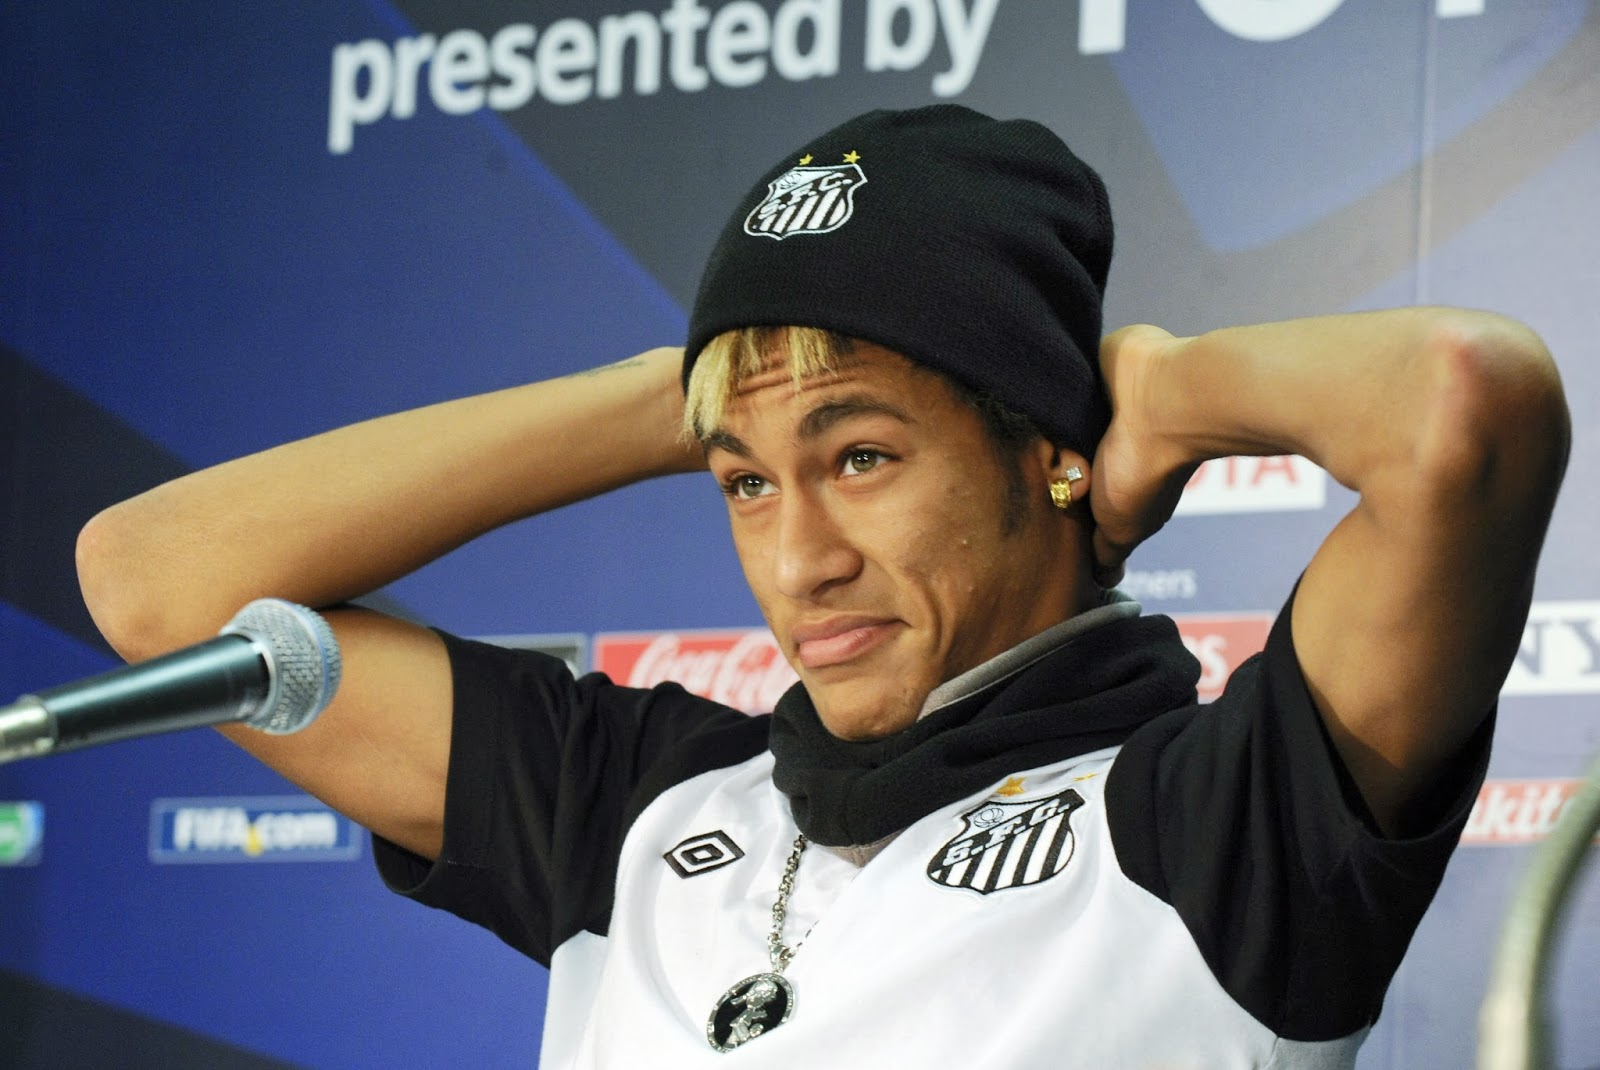 neymar - photo #19